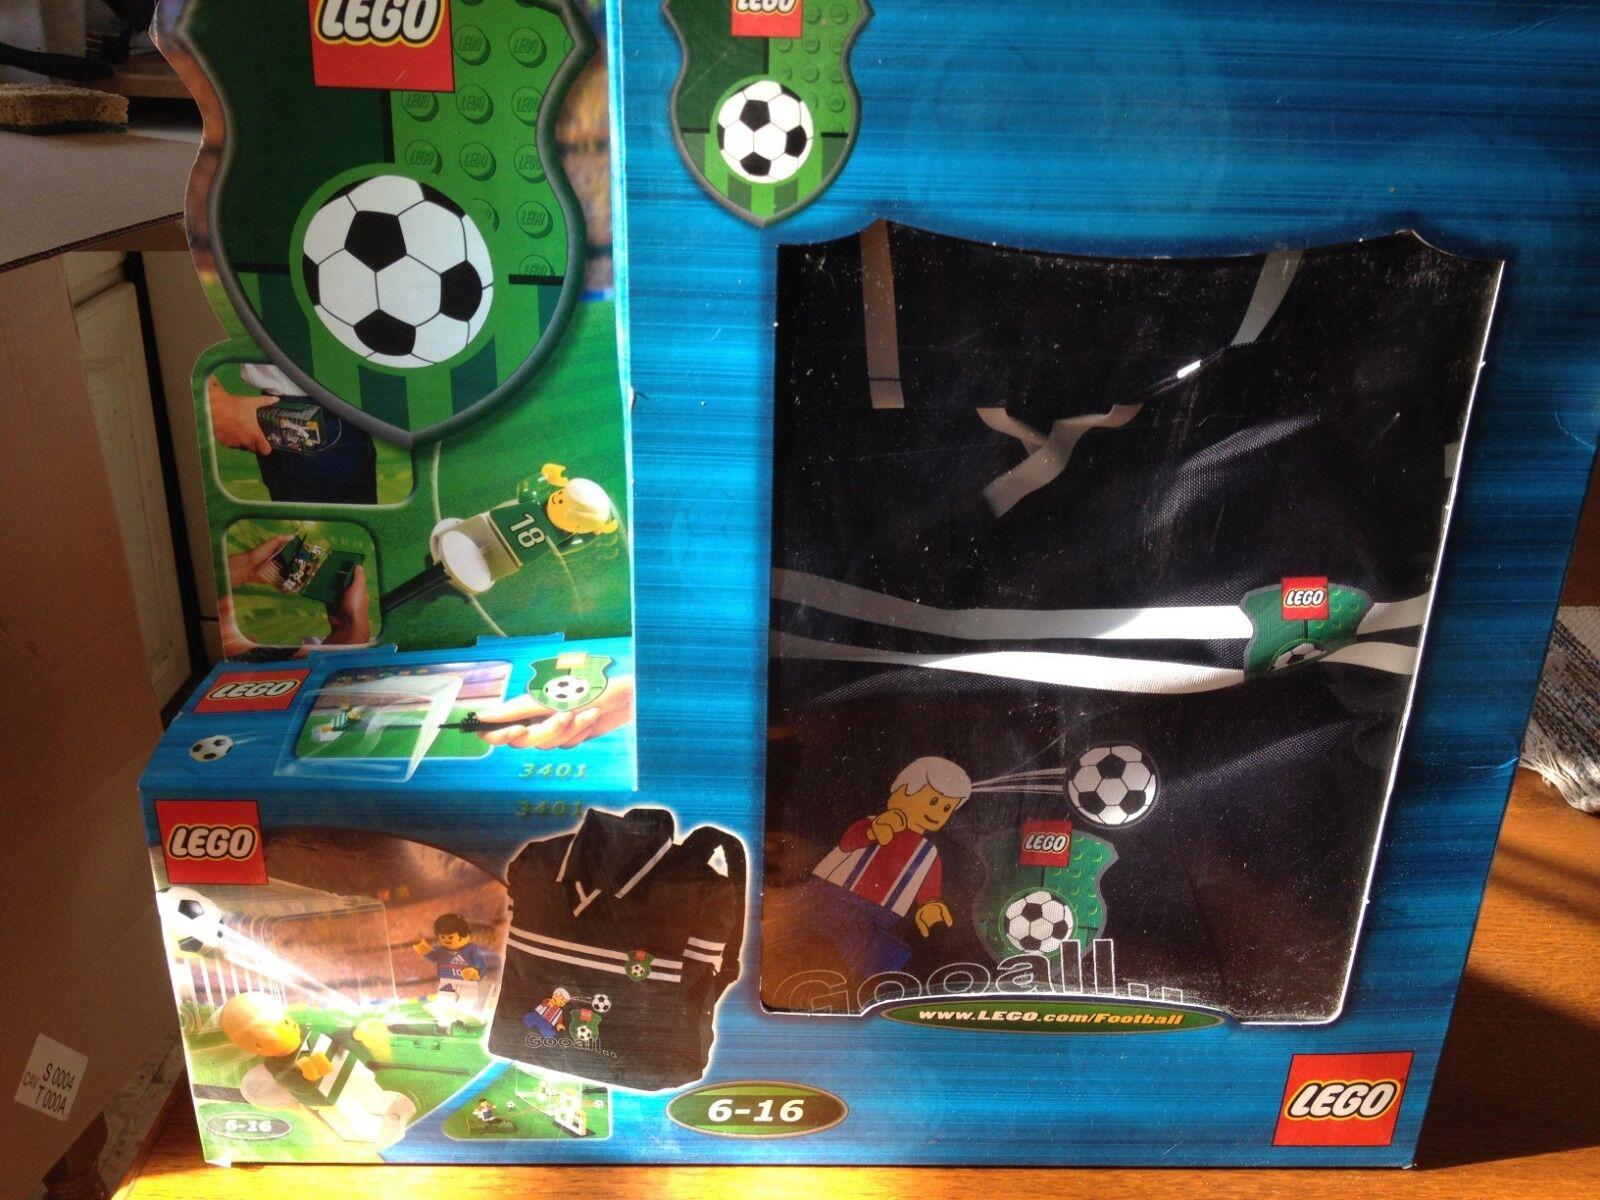 lego City 3401 Sets Exclusif  Avec Sac a dos dos dos Foot NEUF 1 édition | Prix Très Raisonnable  ae0790